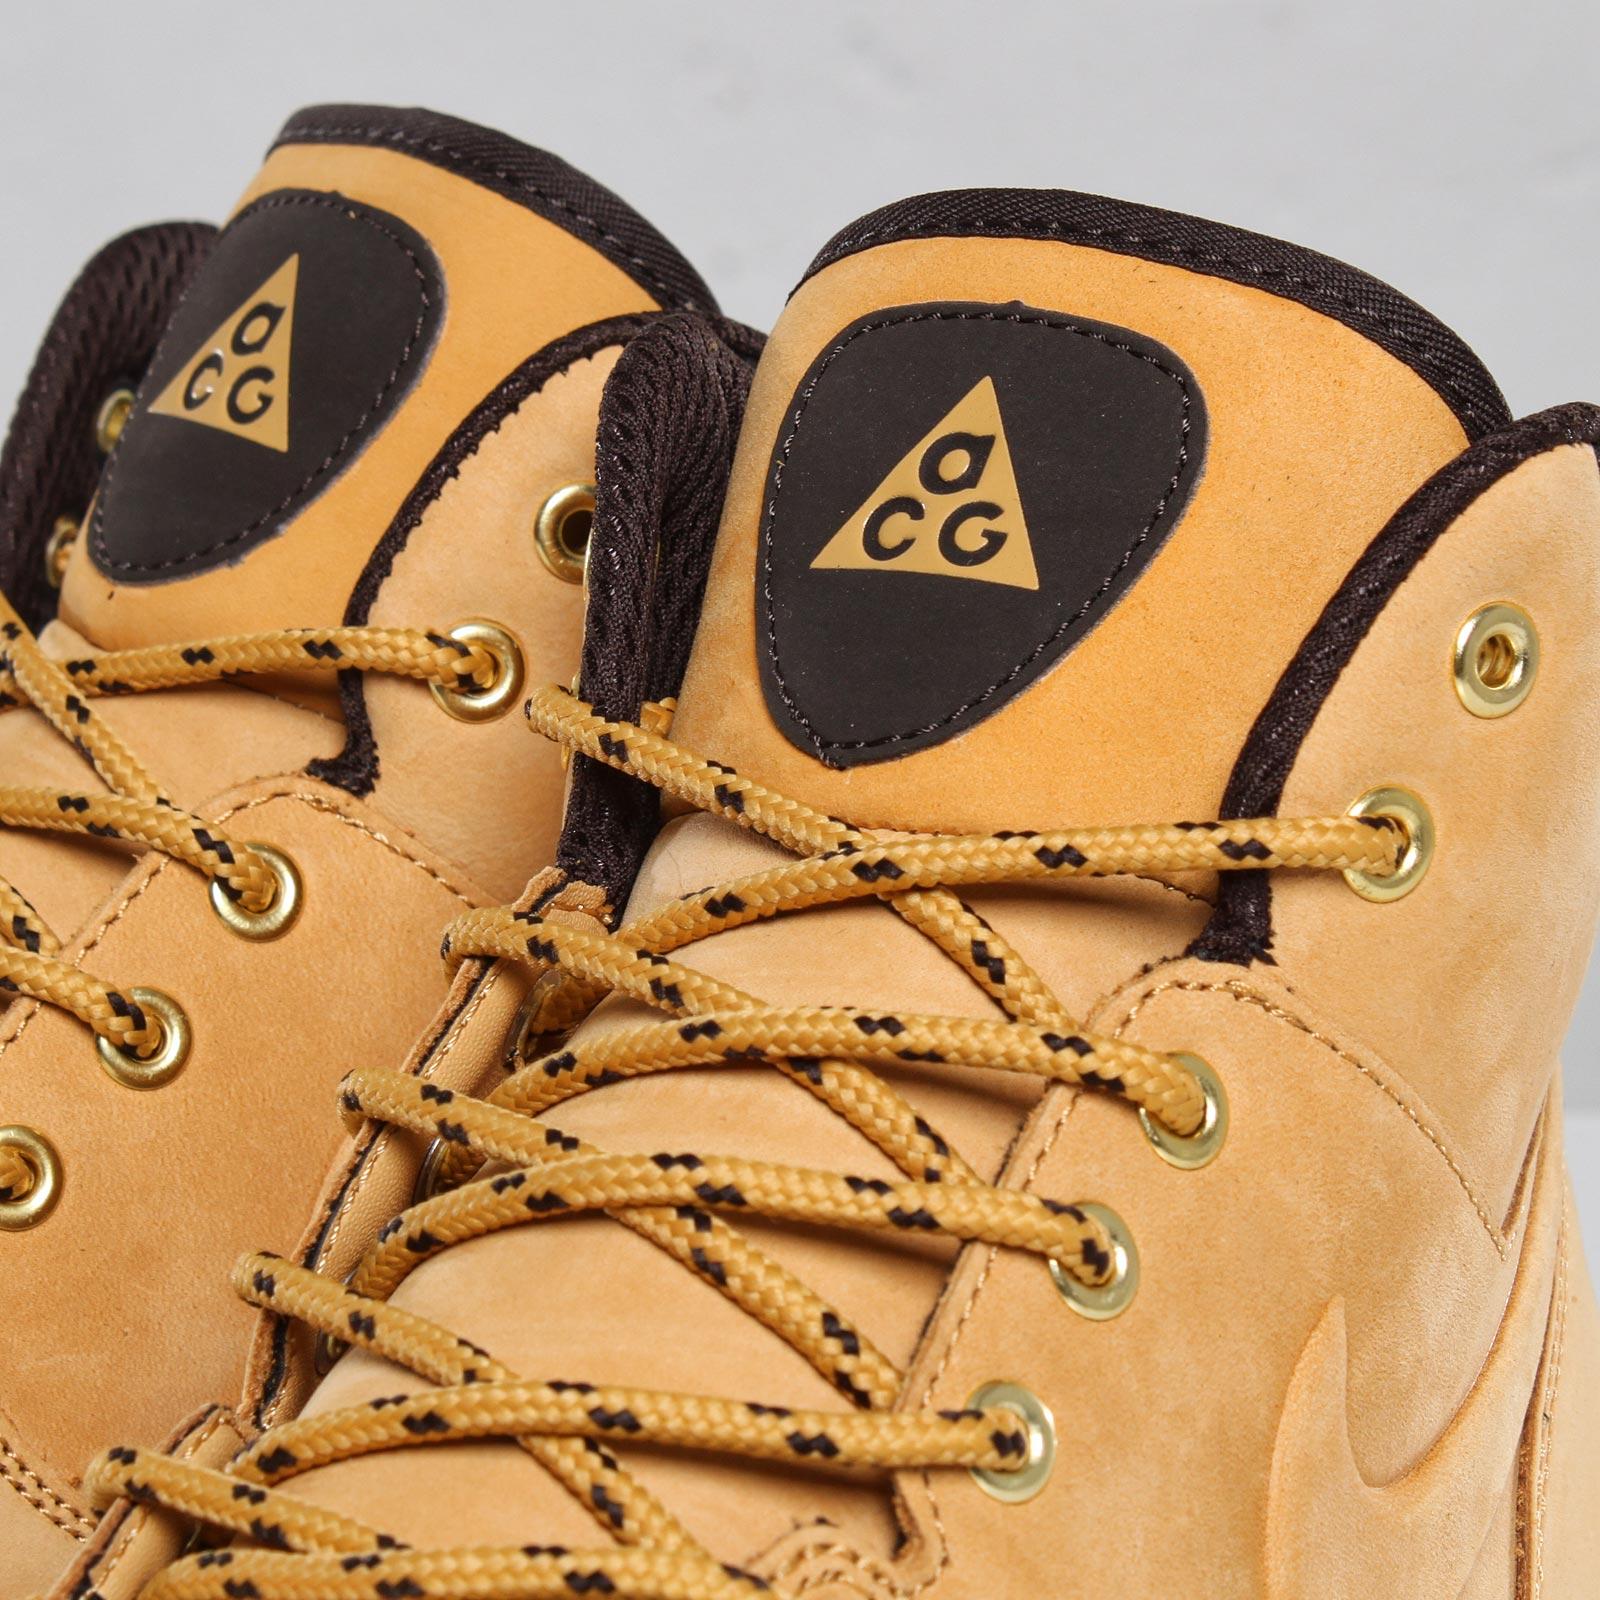 huge selection of 00036 c1fb6 Nike Manoa Leather - 102044 - Sneakersnstuff   sneakers   streetwear online  since 1999